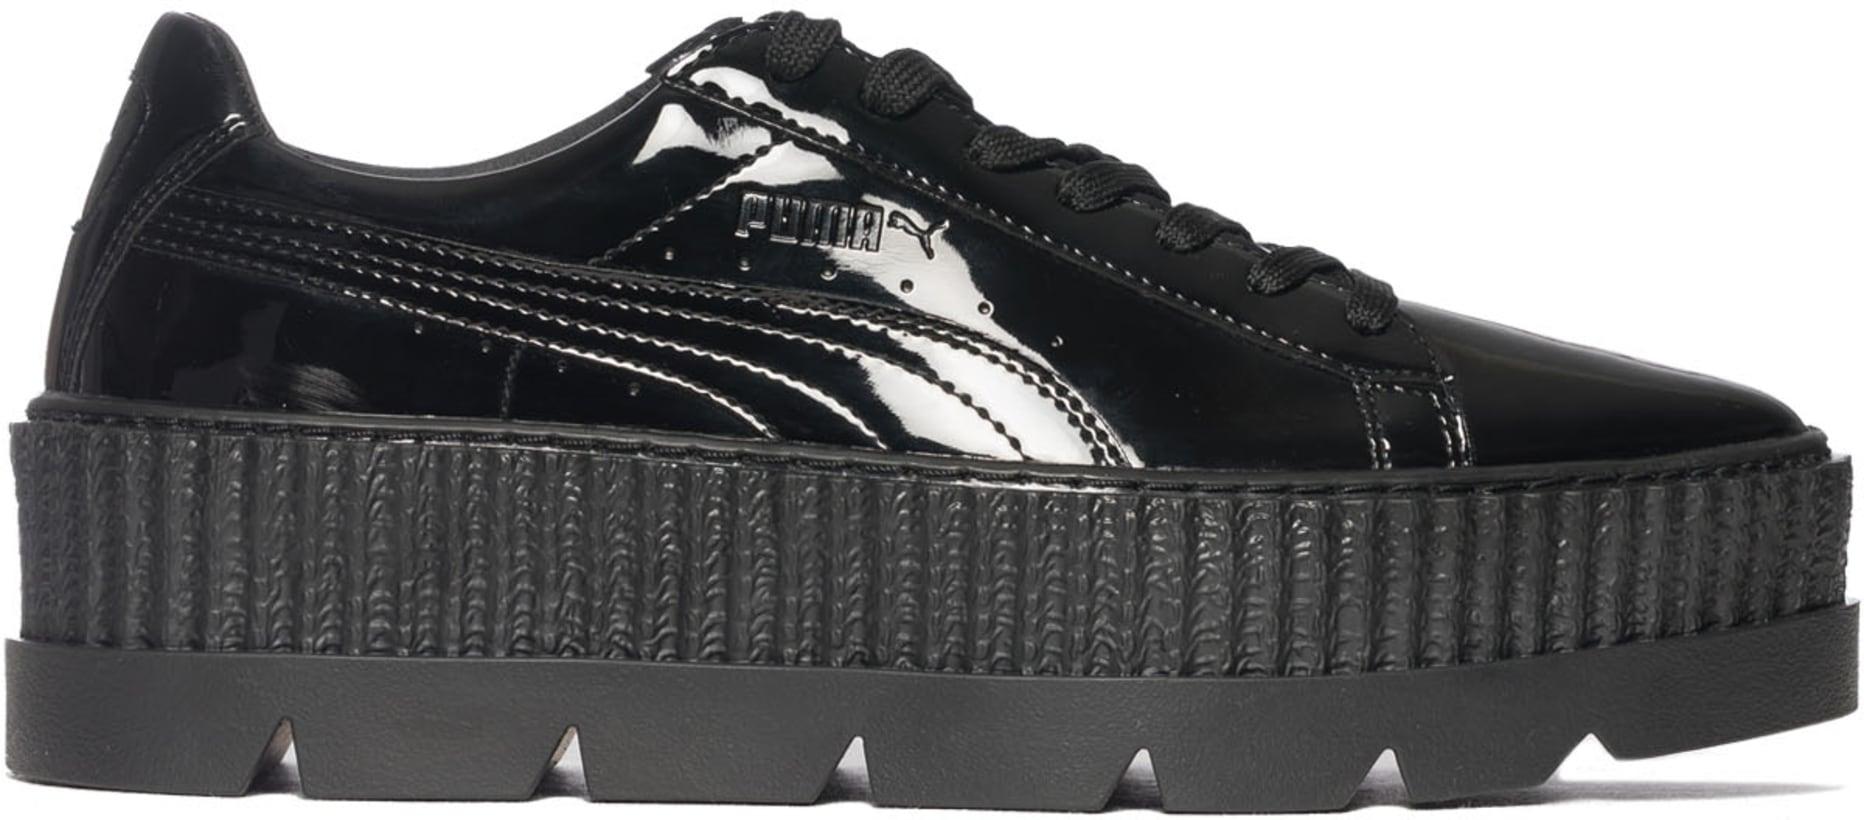 sports shoes 7a287 f5ddc Puma - Fenty Pointy Creeper Patent - Black